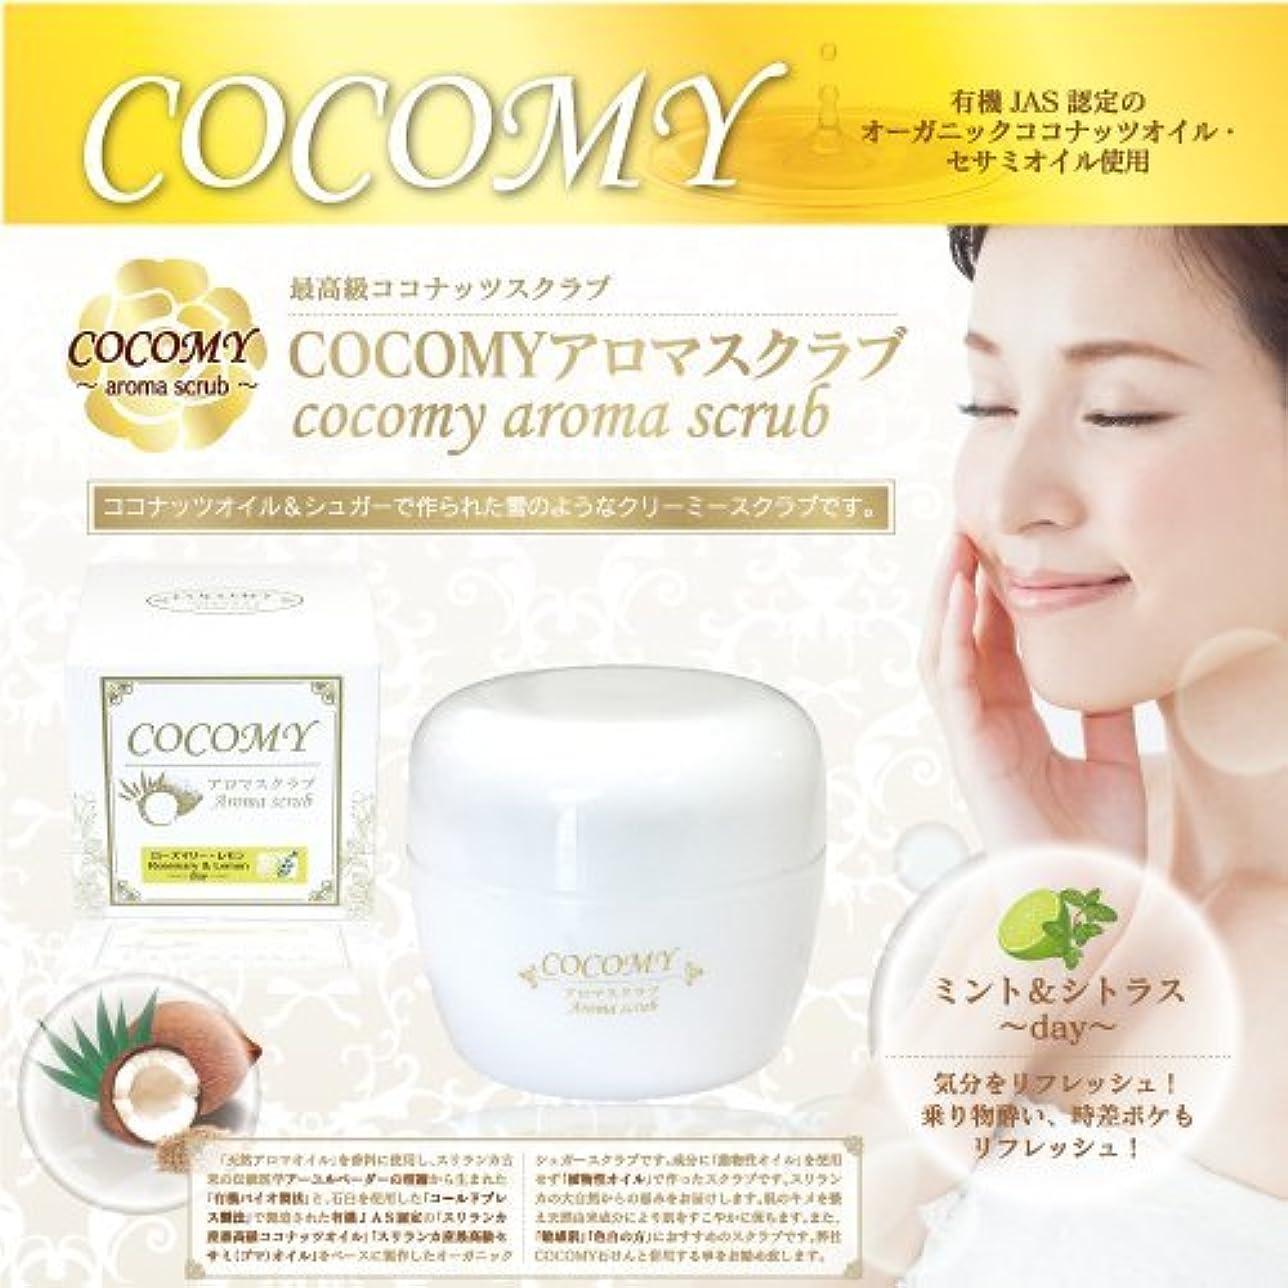 COCOMY aromaスクラブ (ミント&シトラス) 120g